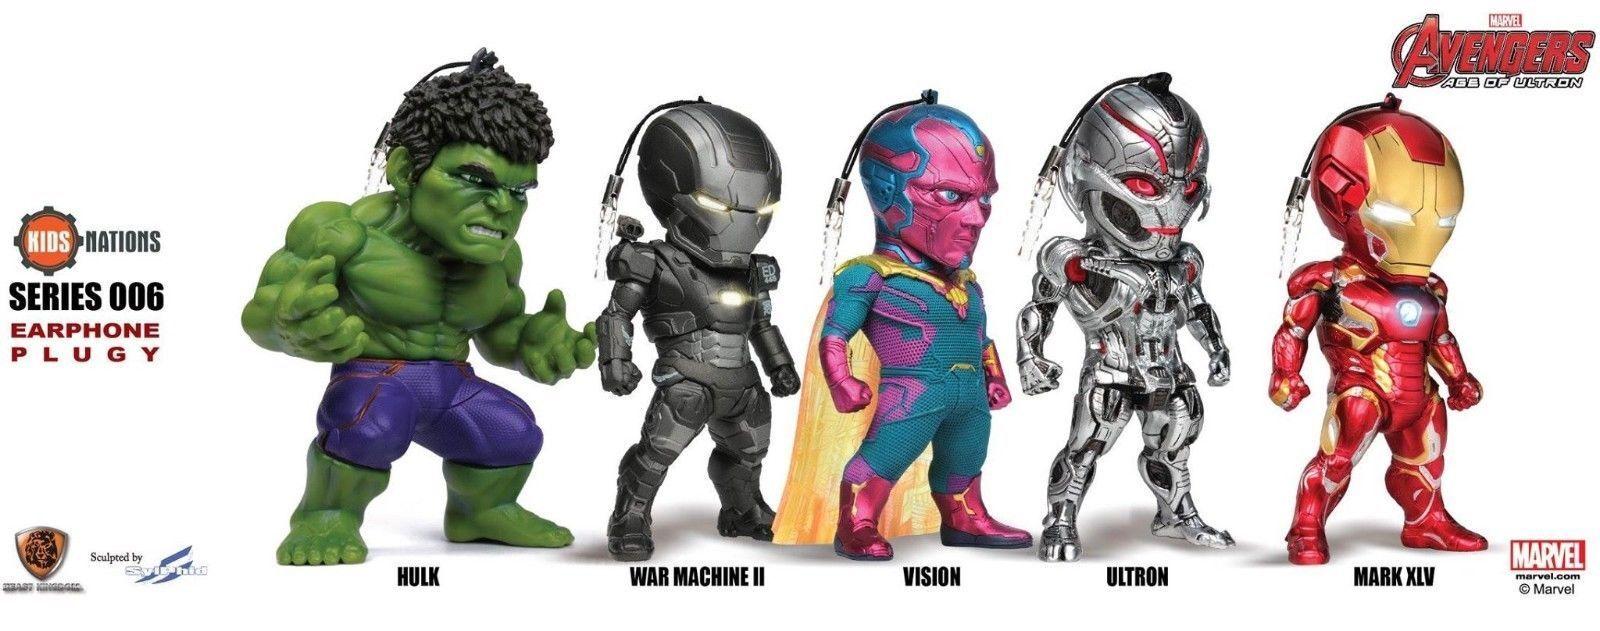 Kids Logic Naciones kn-006 Marvel Avengers Age Of Ultron Led Auricular Plug Set